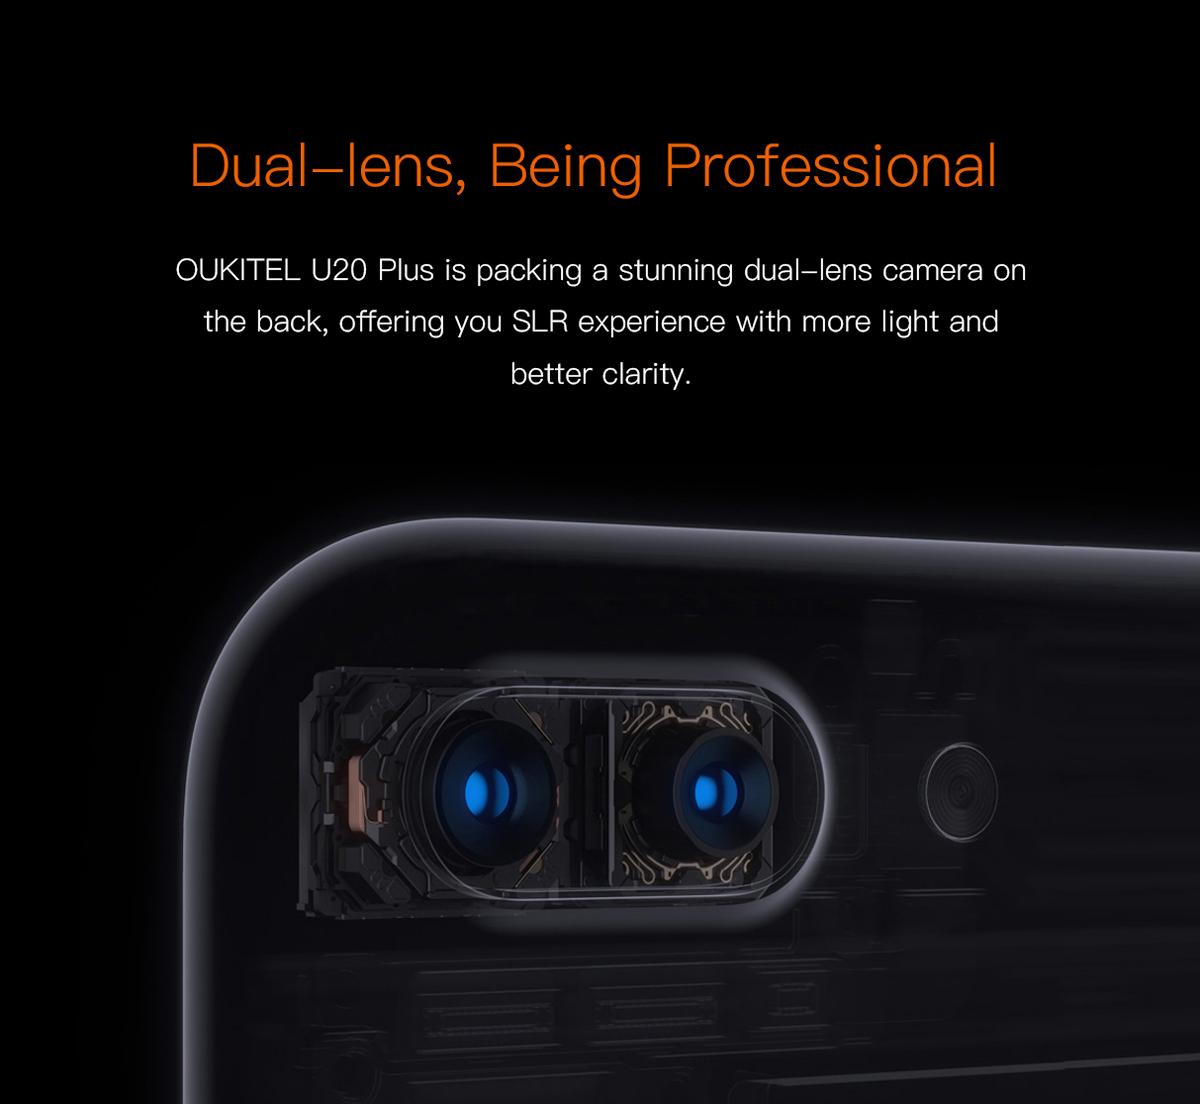 Oukitel U20 Plus kamera